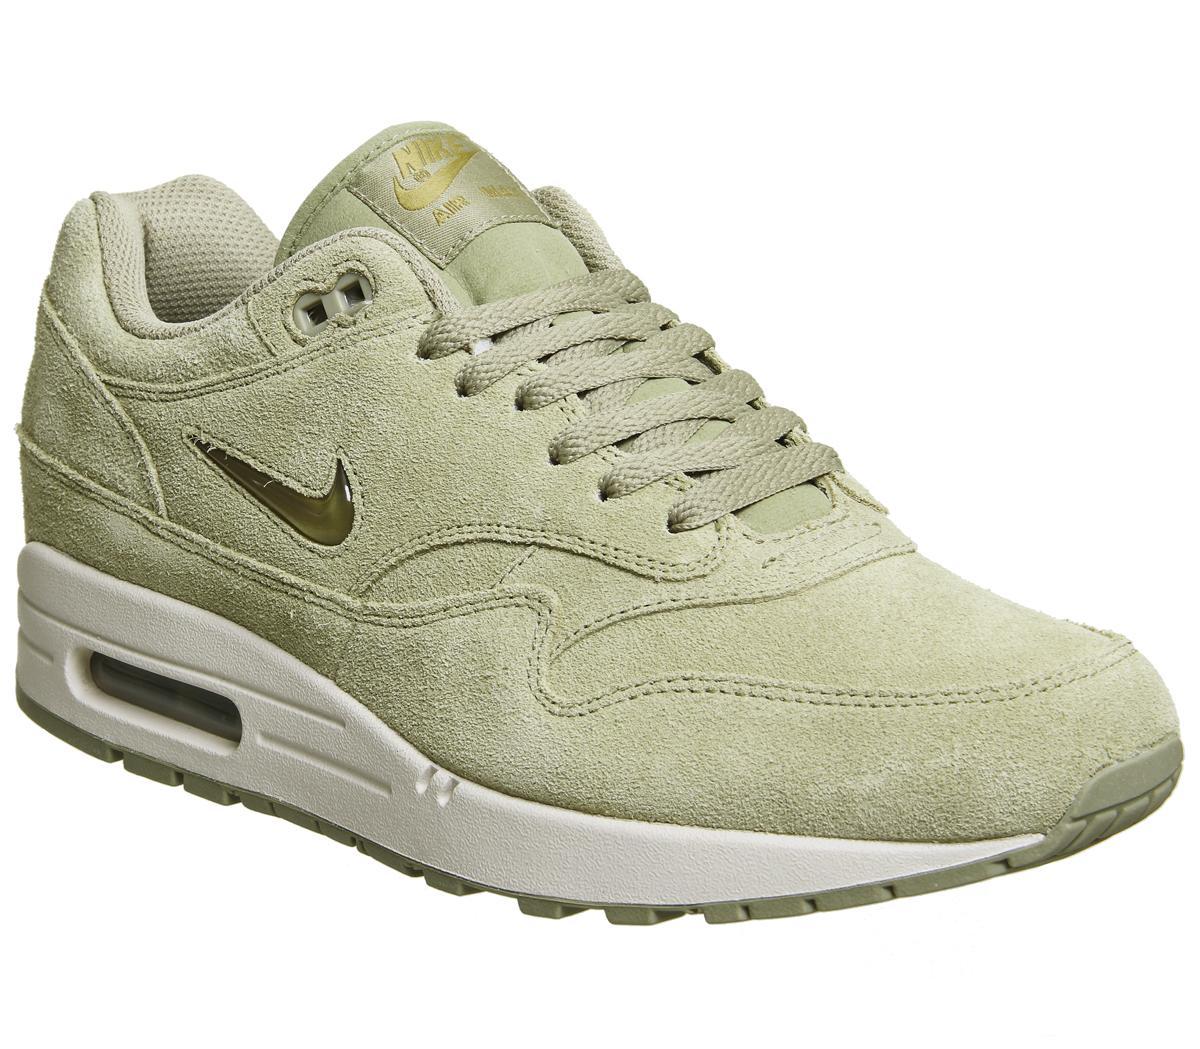 Rabatt Nike Air Max 1 Jewel Suede Trainers Neutral Olive www